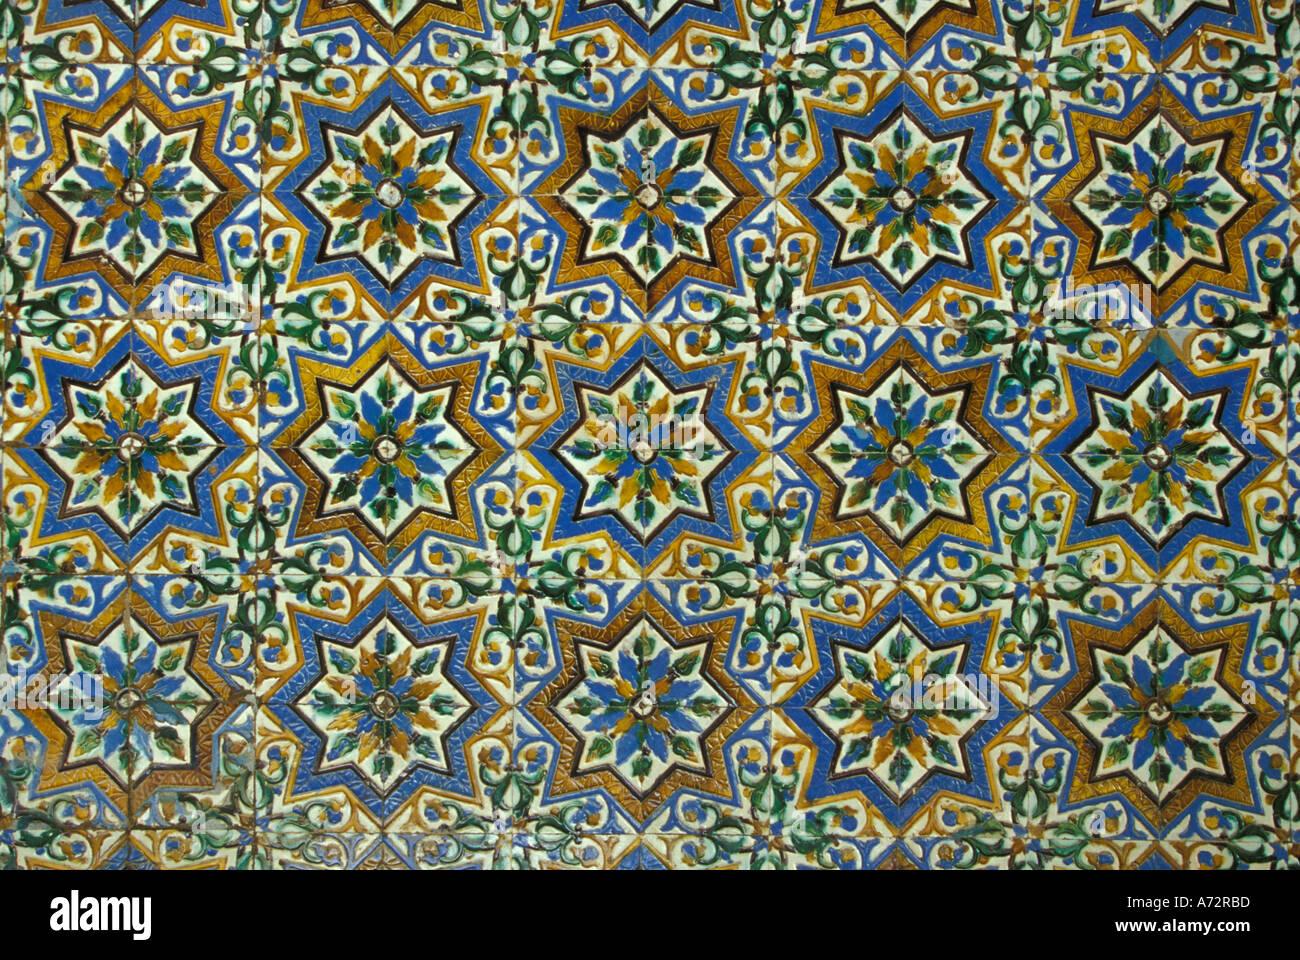 Spain Sevilla Andalucia Moorish Mosaic Azulejos ceramic